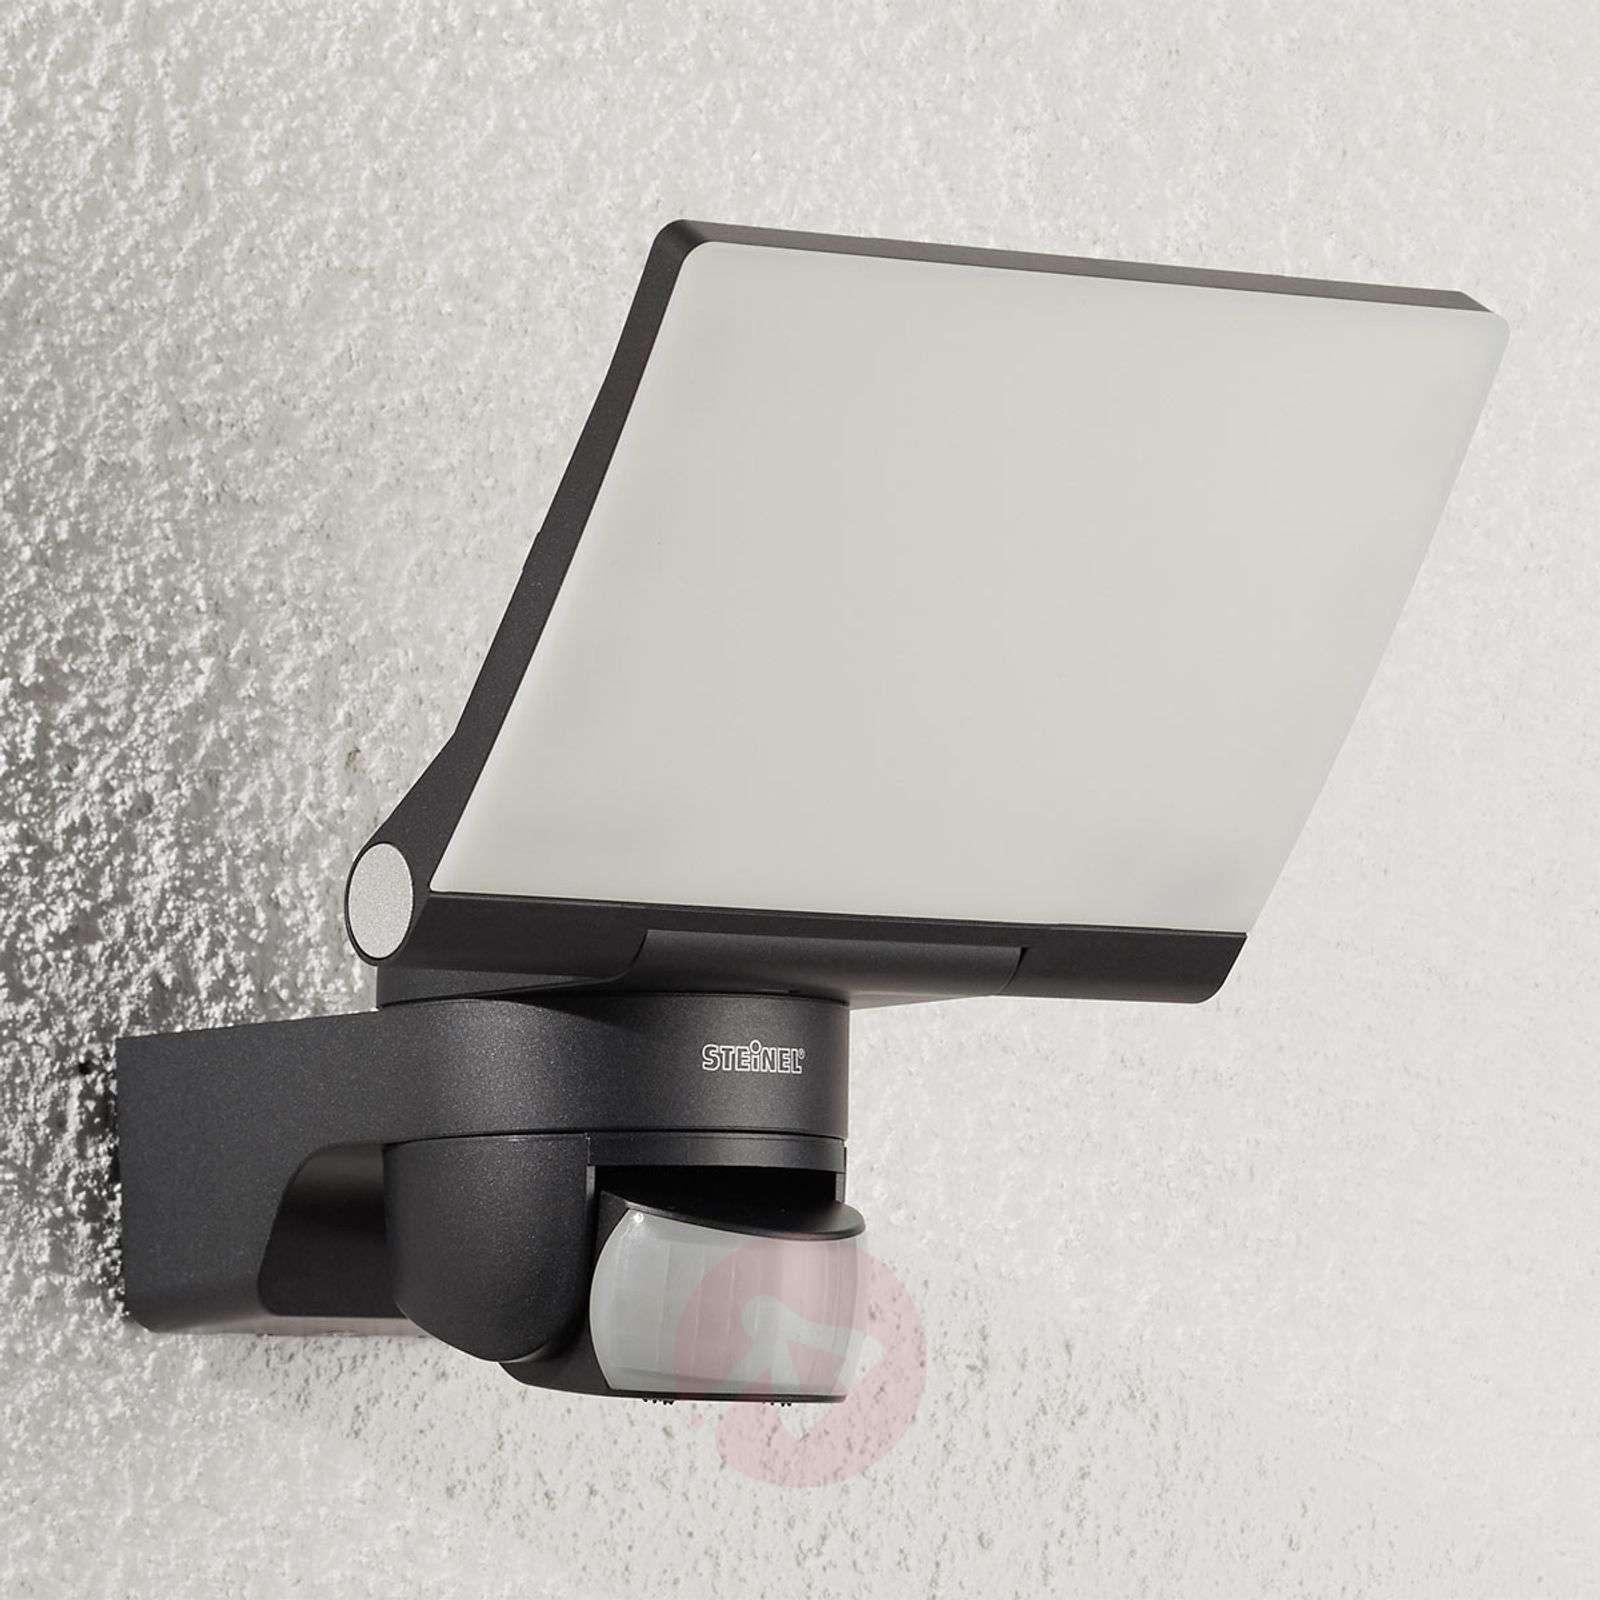 LED-ulkoseinävalaisin XLED Home 2 XL, IR-tunnistin-8505697-01